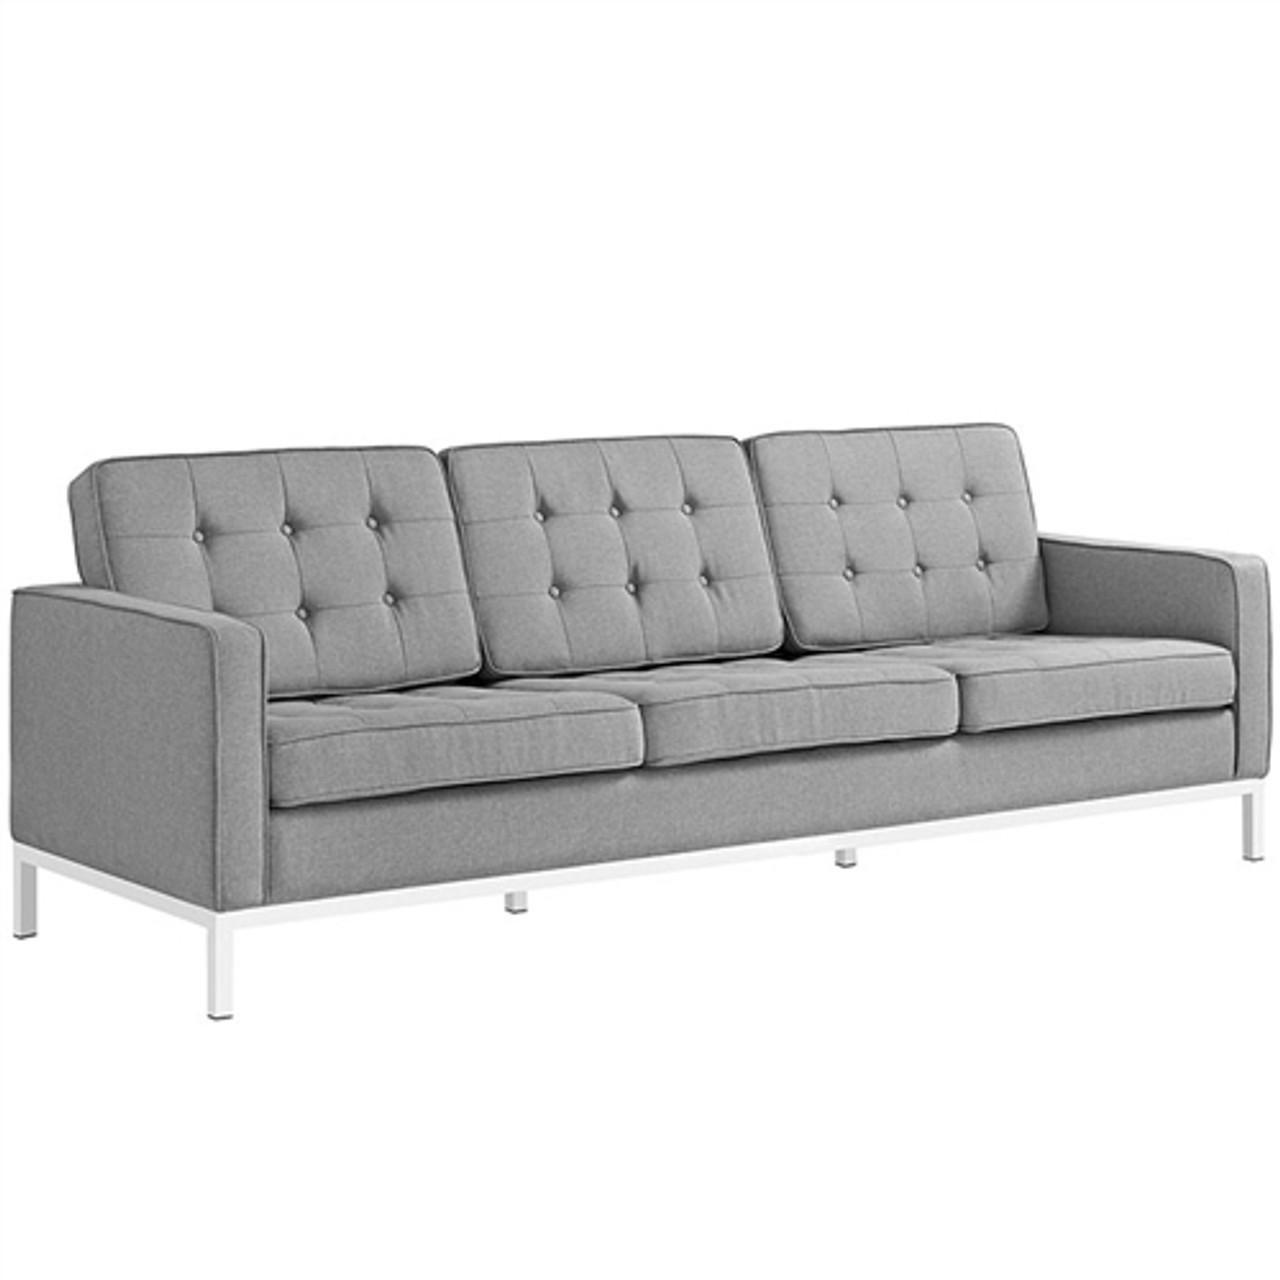 Modway Loft Contemporary Tufted Sofa EEI-2052